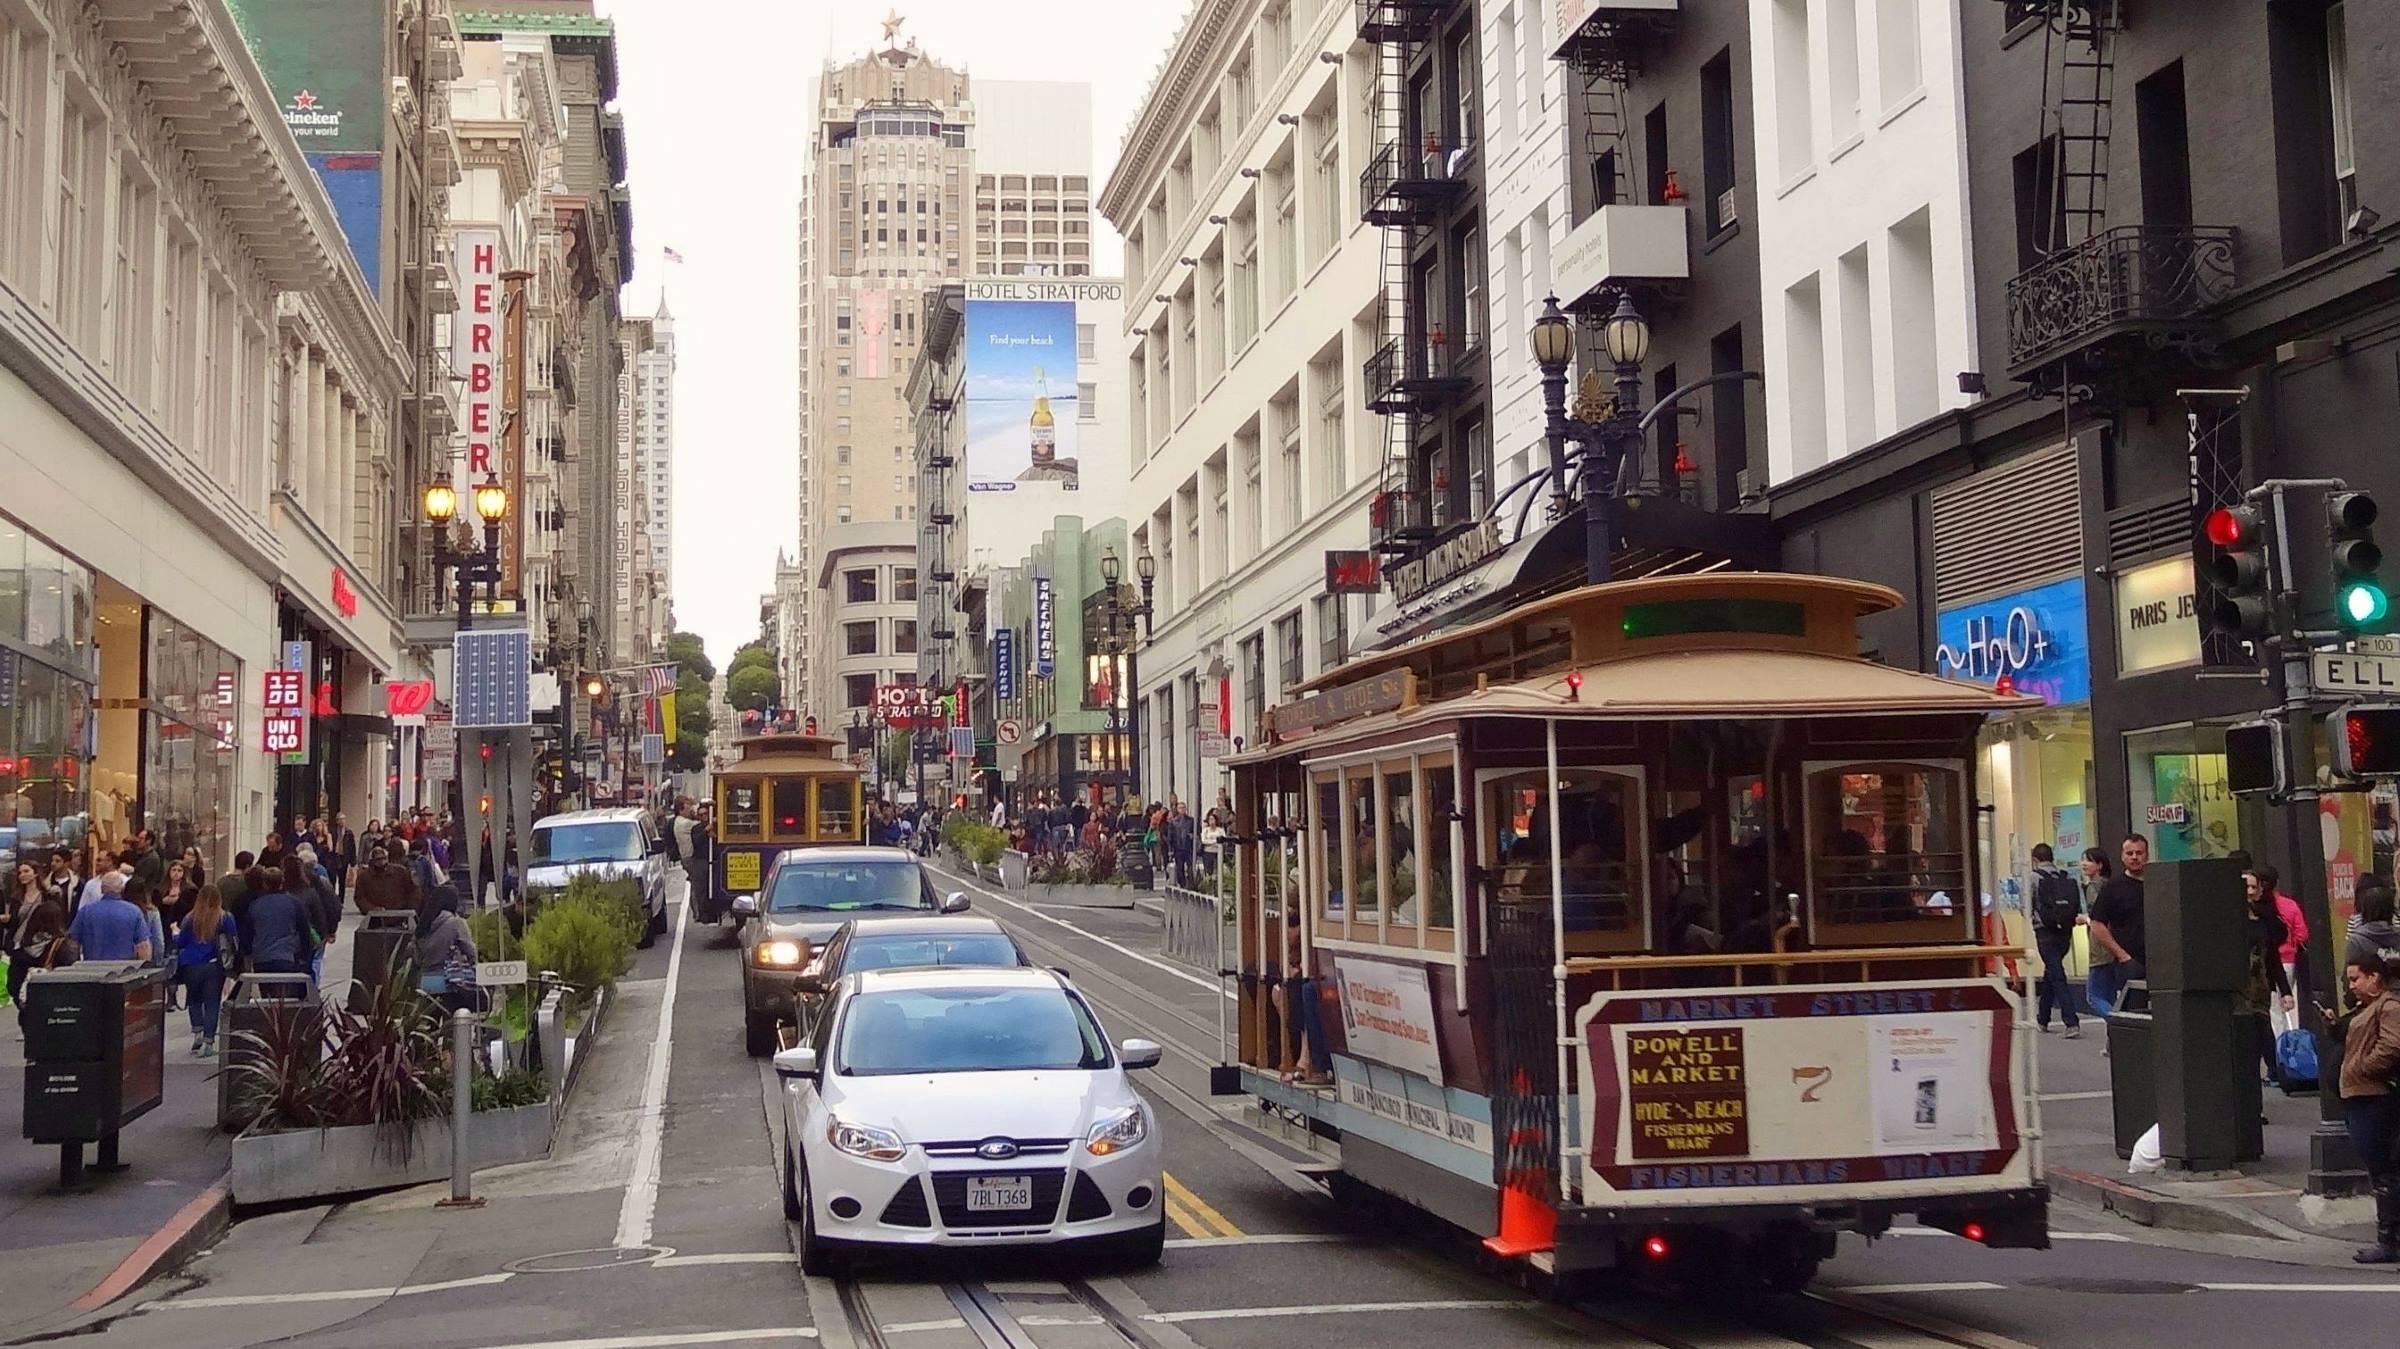 san francisco califonia street tram shops